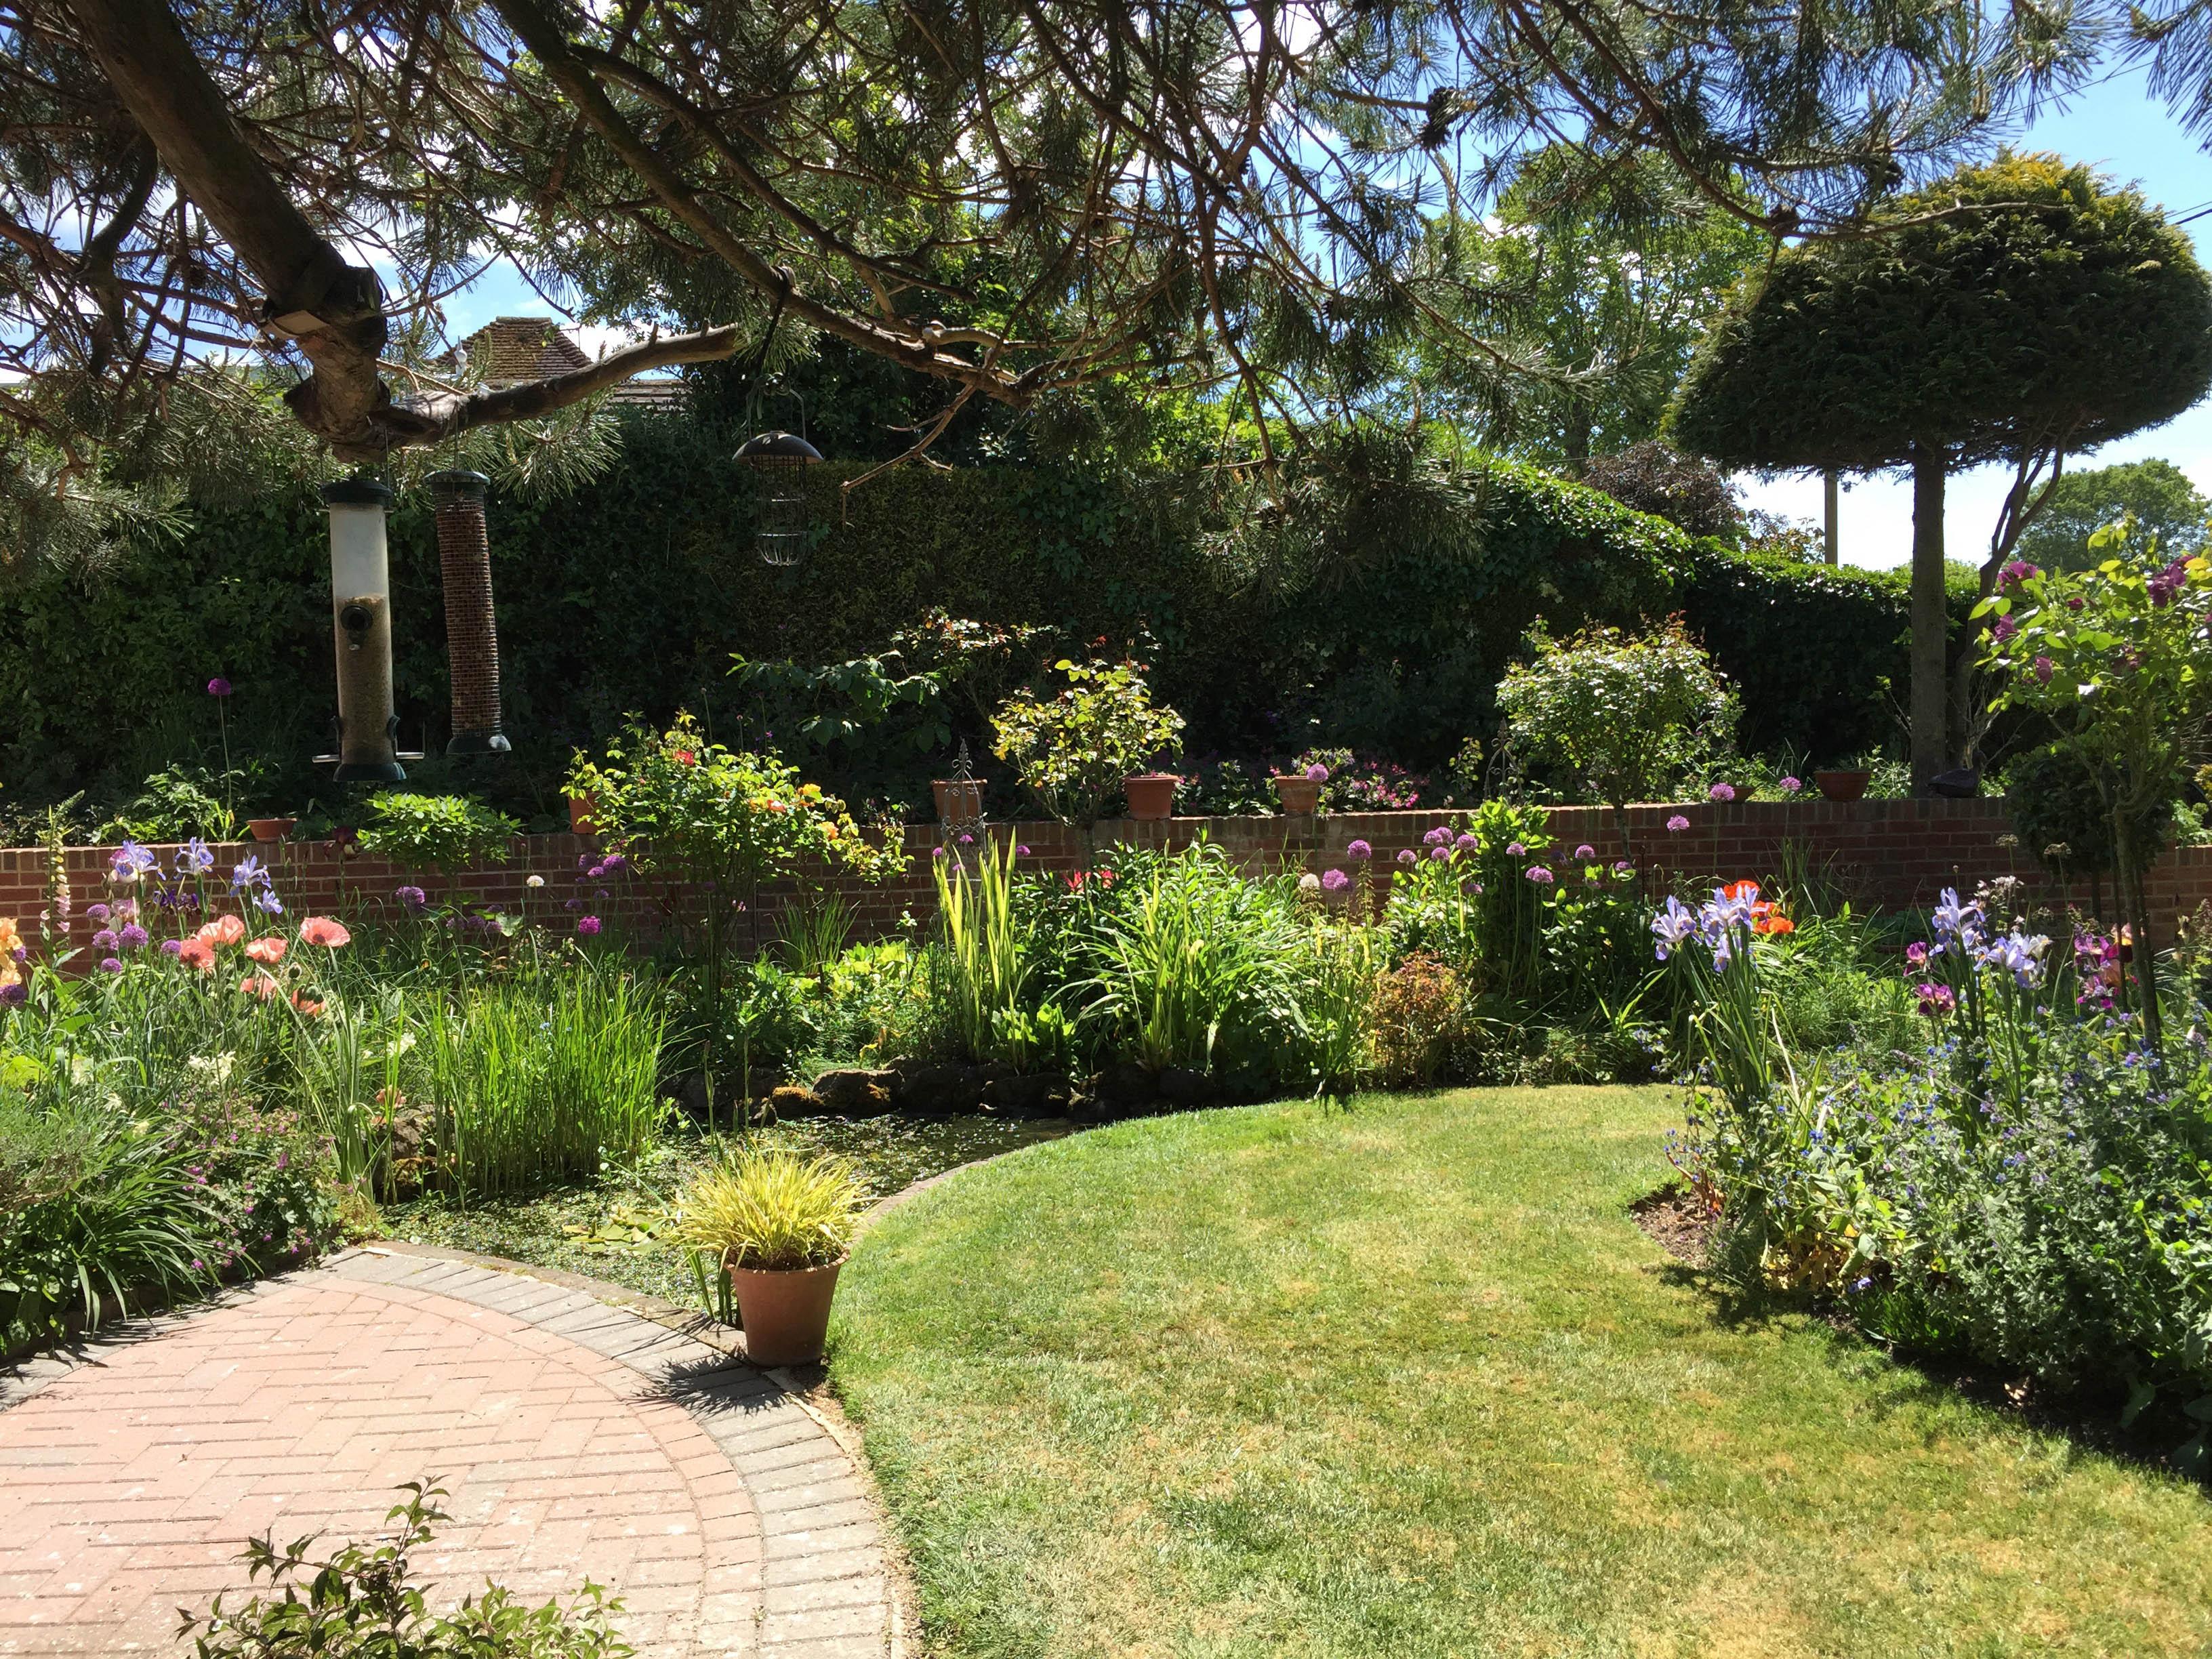 A photo of Pamela's beautiful garden